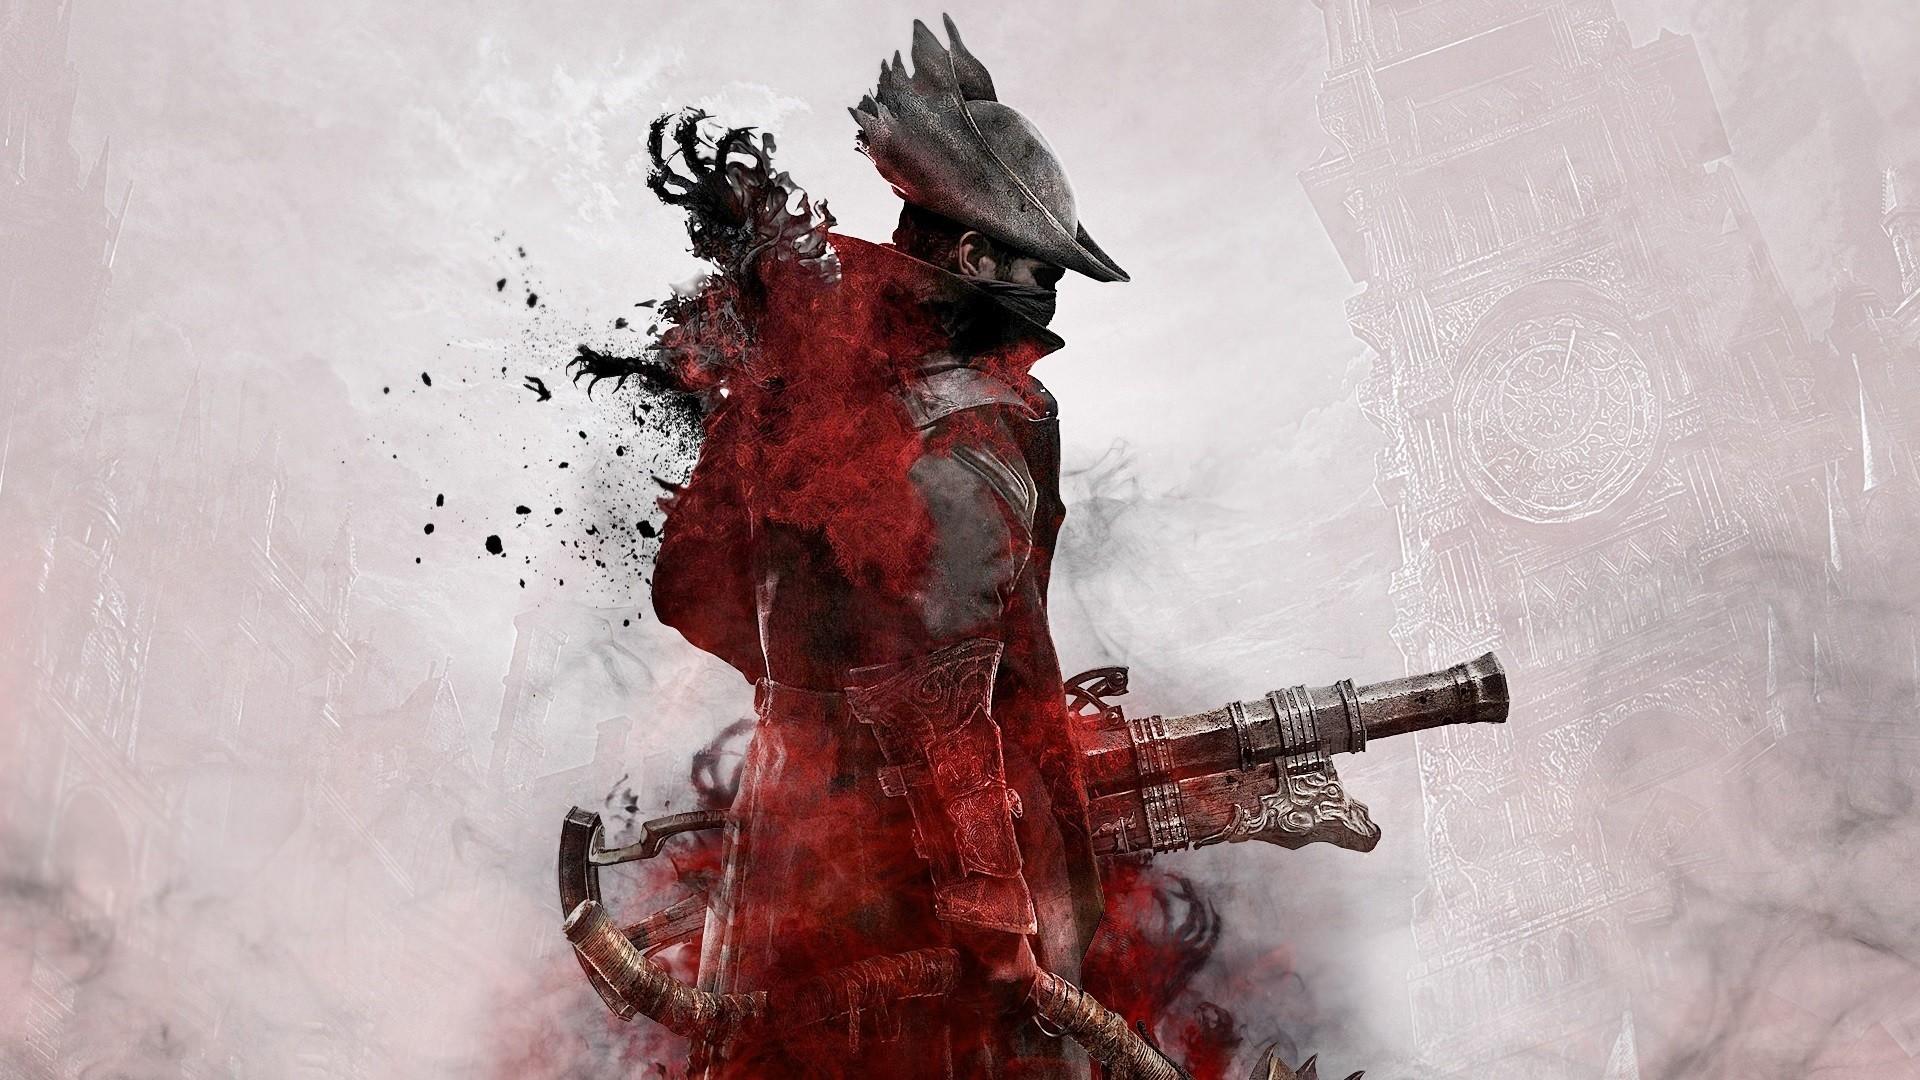 Bloodborne wallpaper 85 immagini - Bloodborne download ...